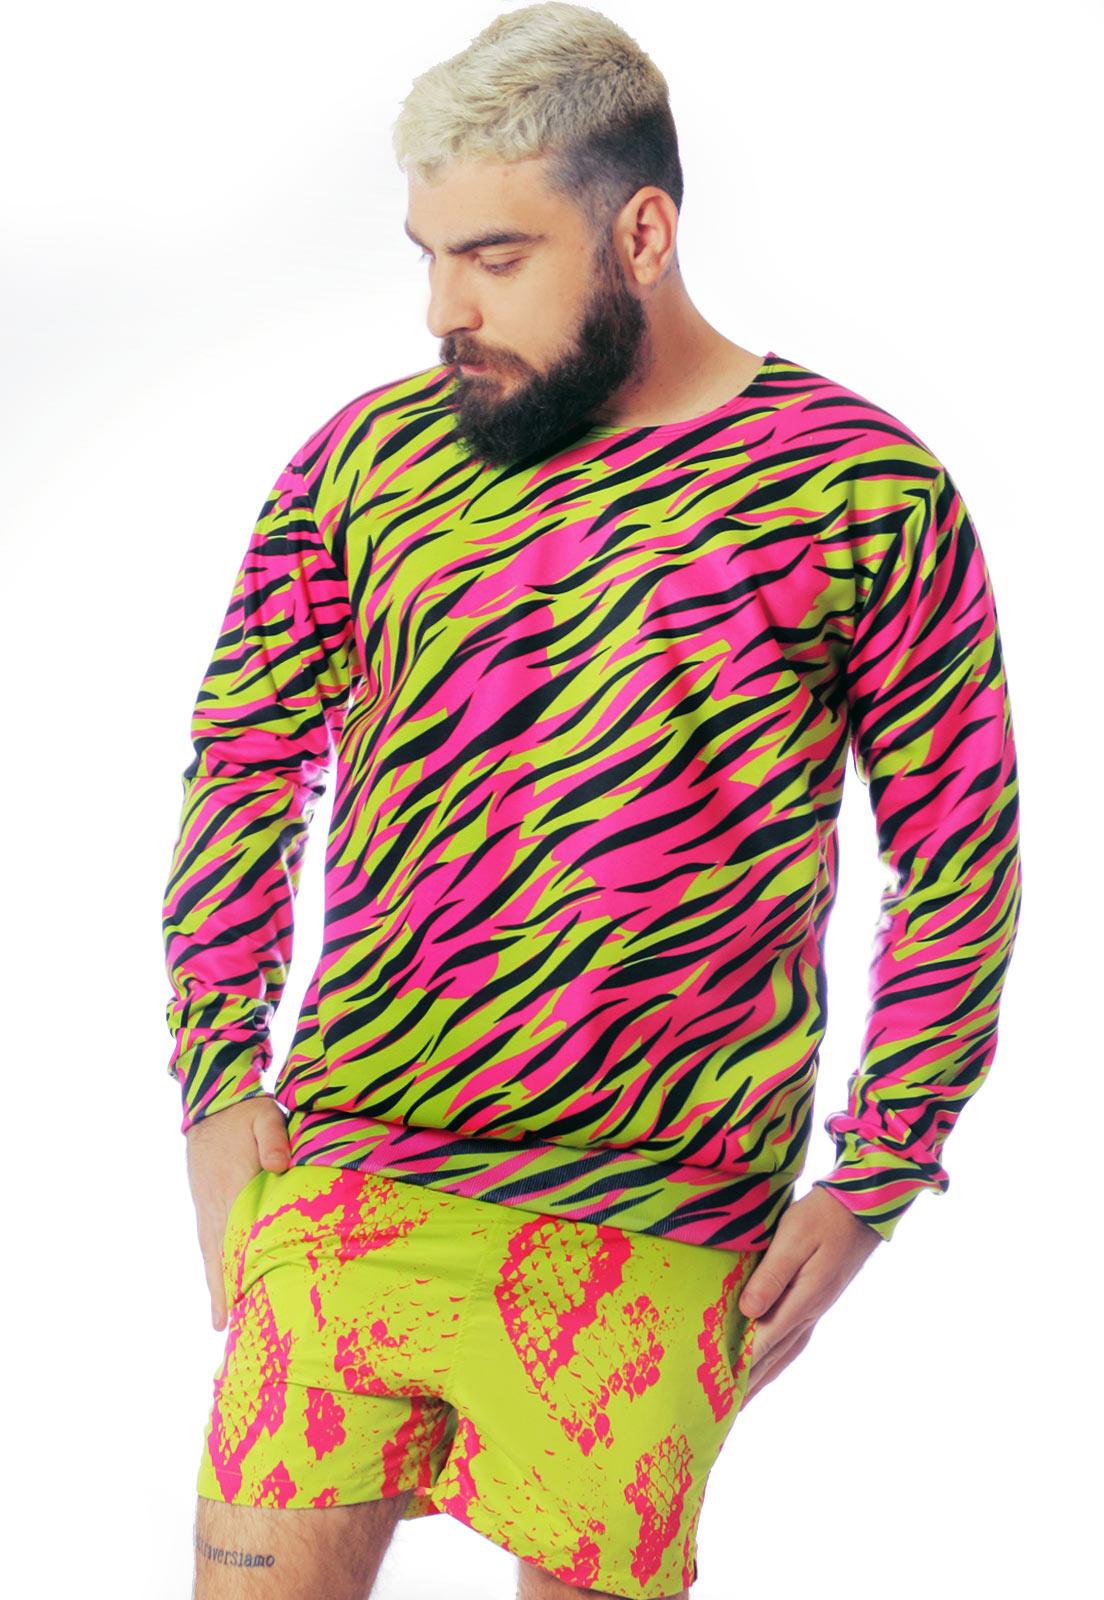 Blusa Moletom Neon Estampada ElephunK Fashion Animal Print Rosa